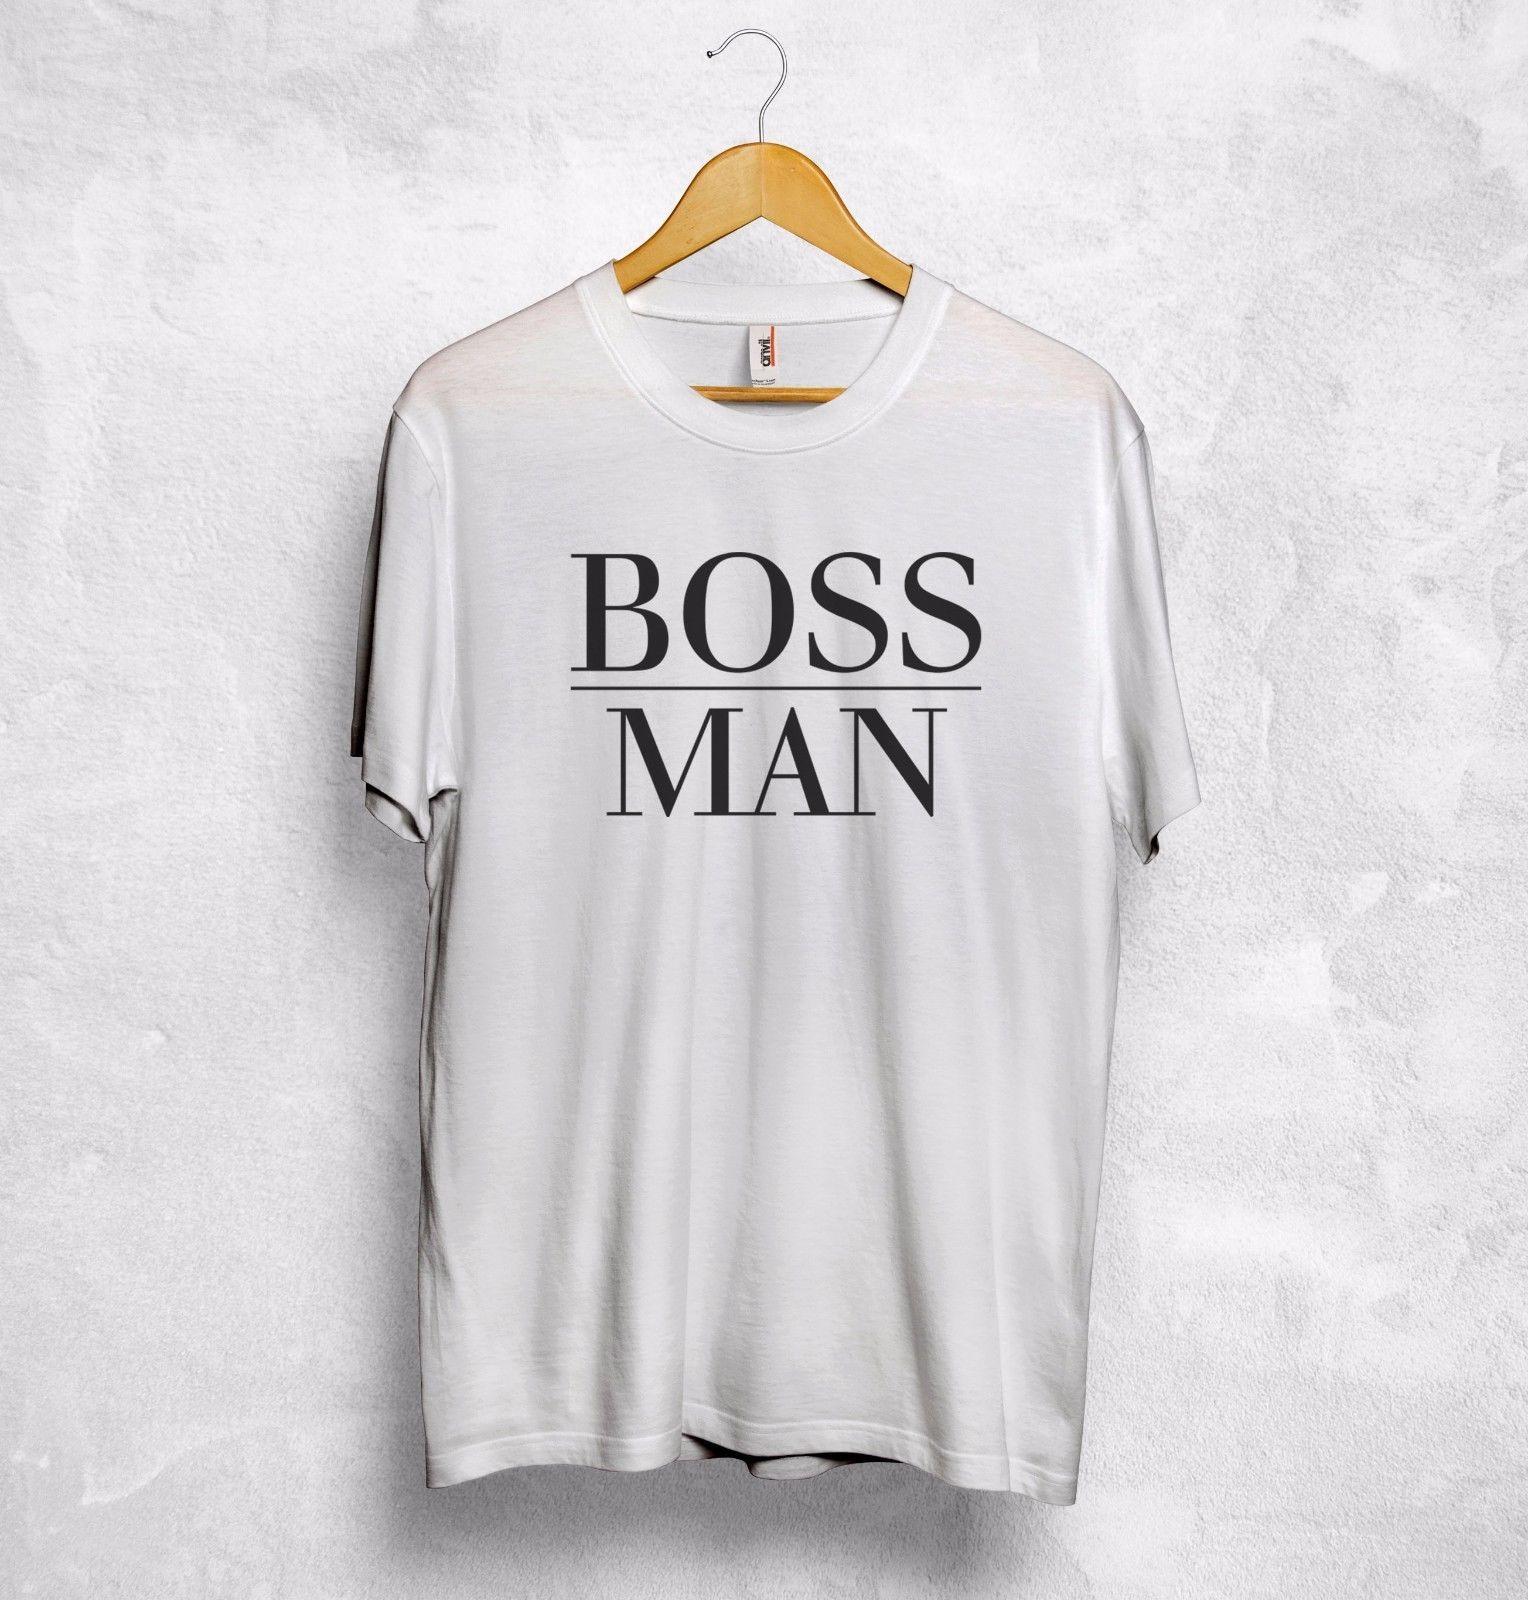 BOSS Man Lady T Shirt Girlfriend Wife Gift Valentines Hubby Husband Couple  Hip Hop men tshirt rock Unisex t shirt Fashion Tops Cool